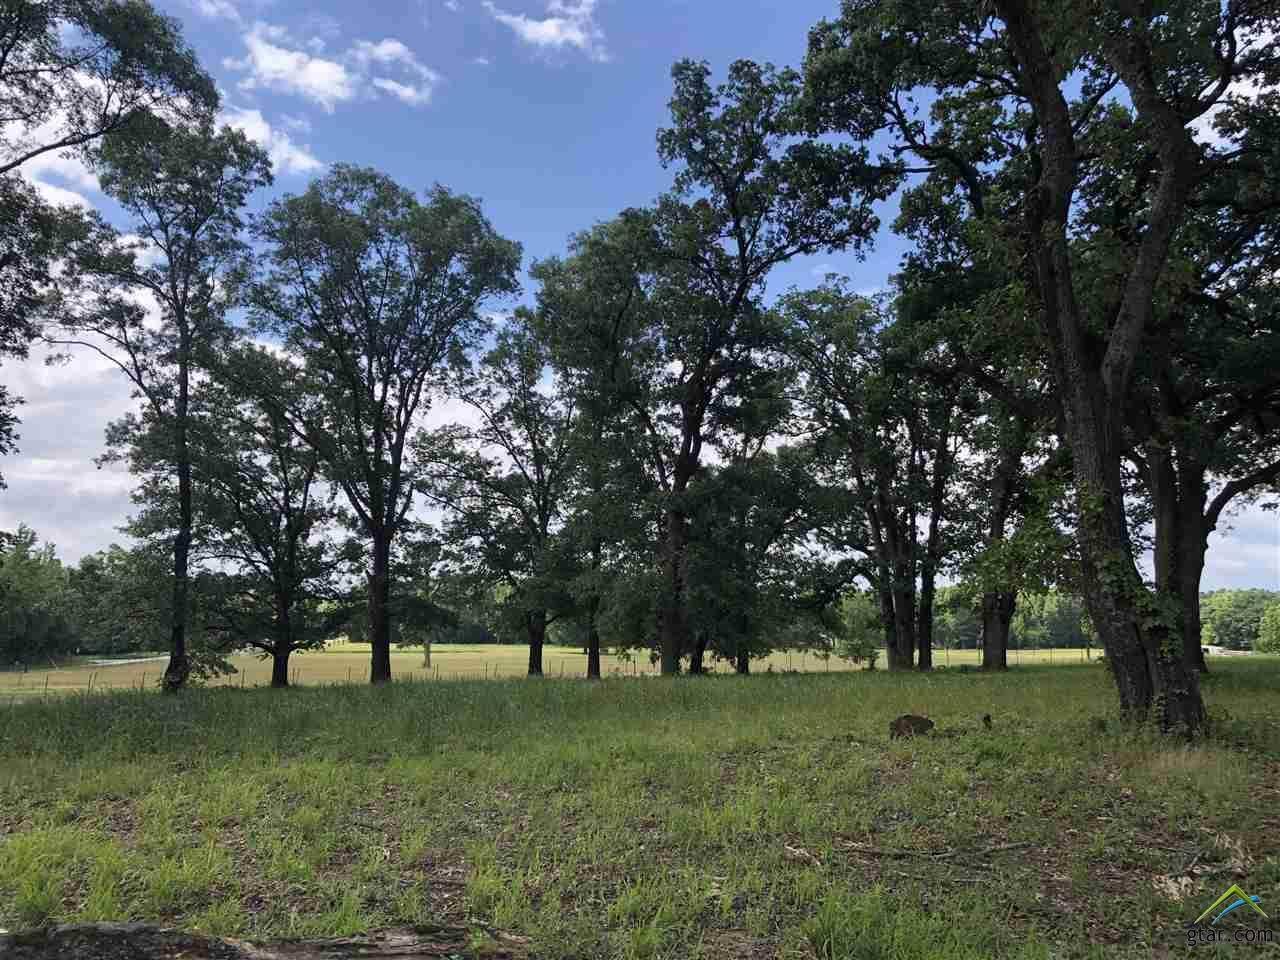 18358 Timber Oaks Dr (Lot 2) - Photo 1